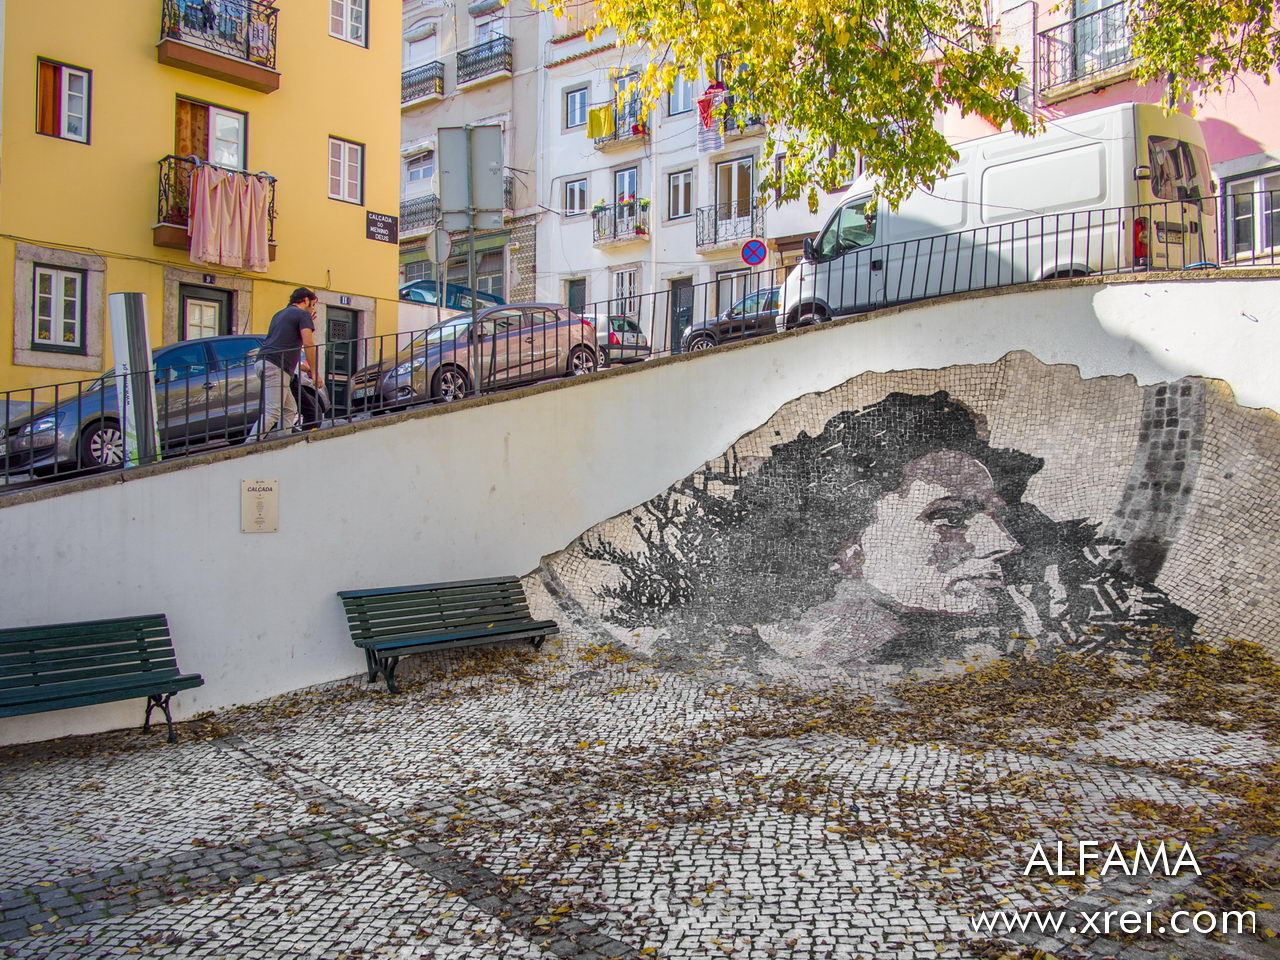 Alfama with Portuguese stone design by fado singer Amálida Rodrigues